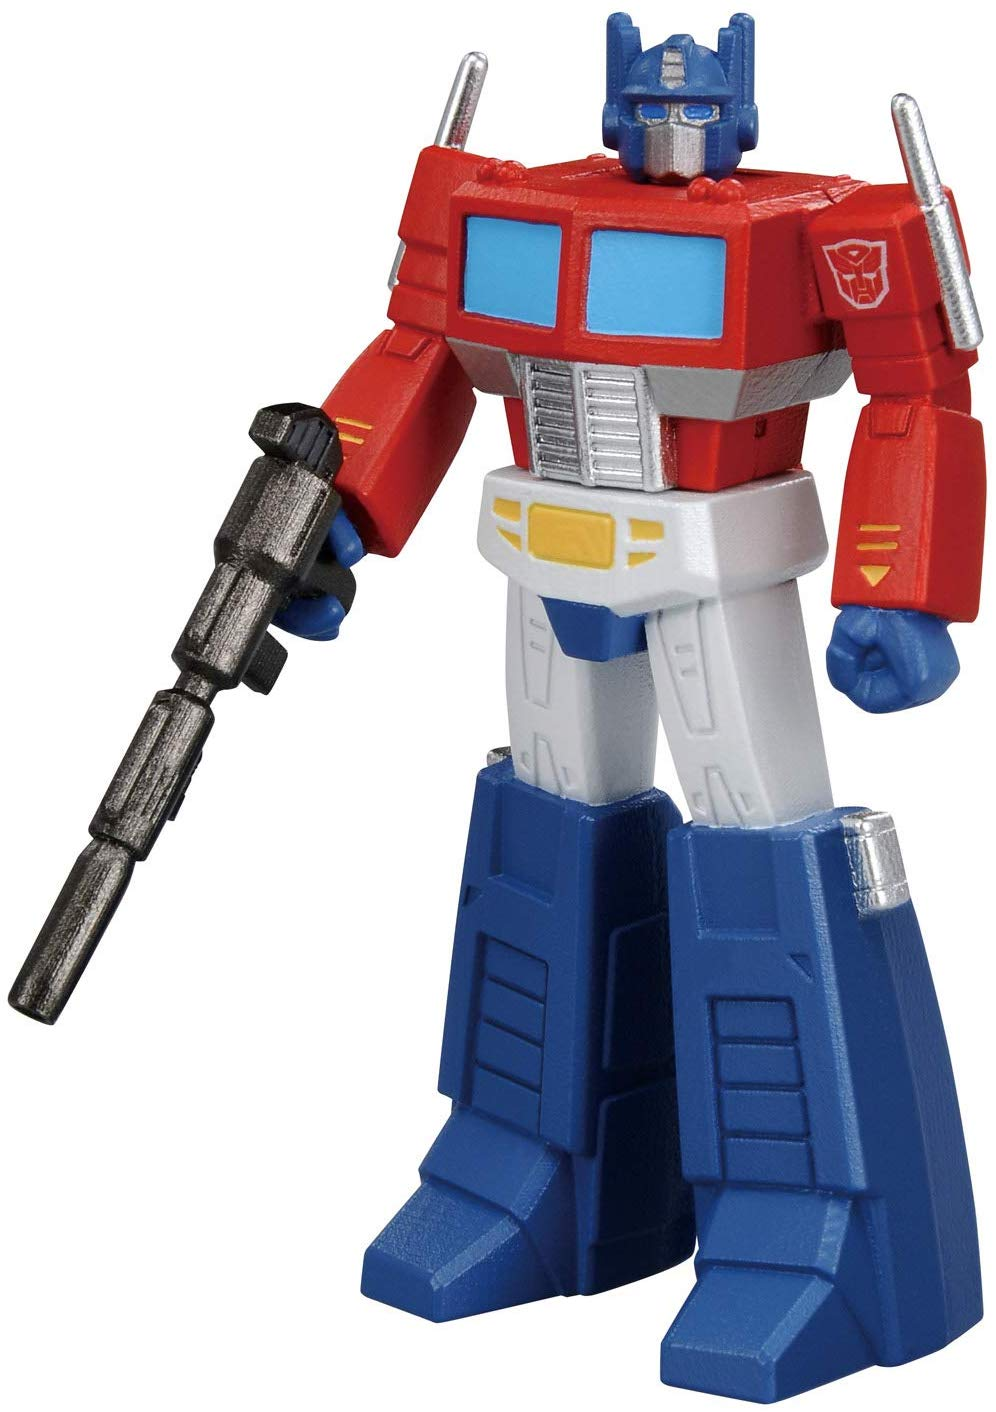 Takara Tomy MetaColle Series G1 Transformers & Insignias ...